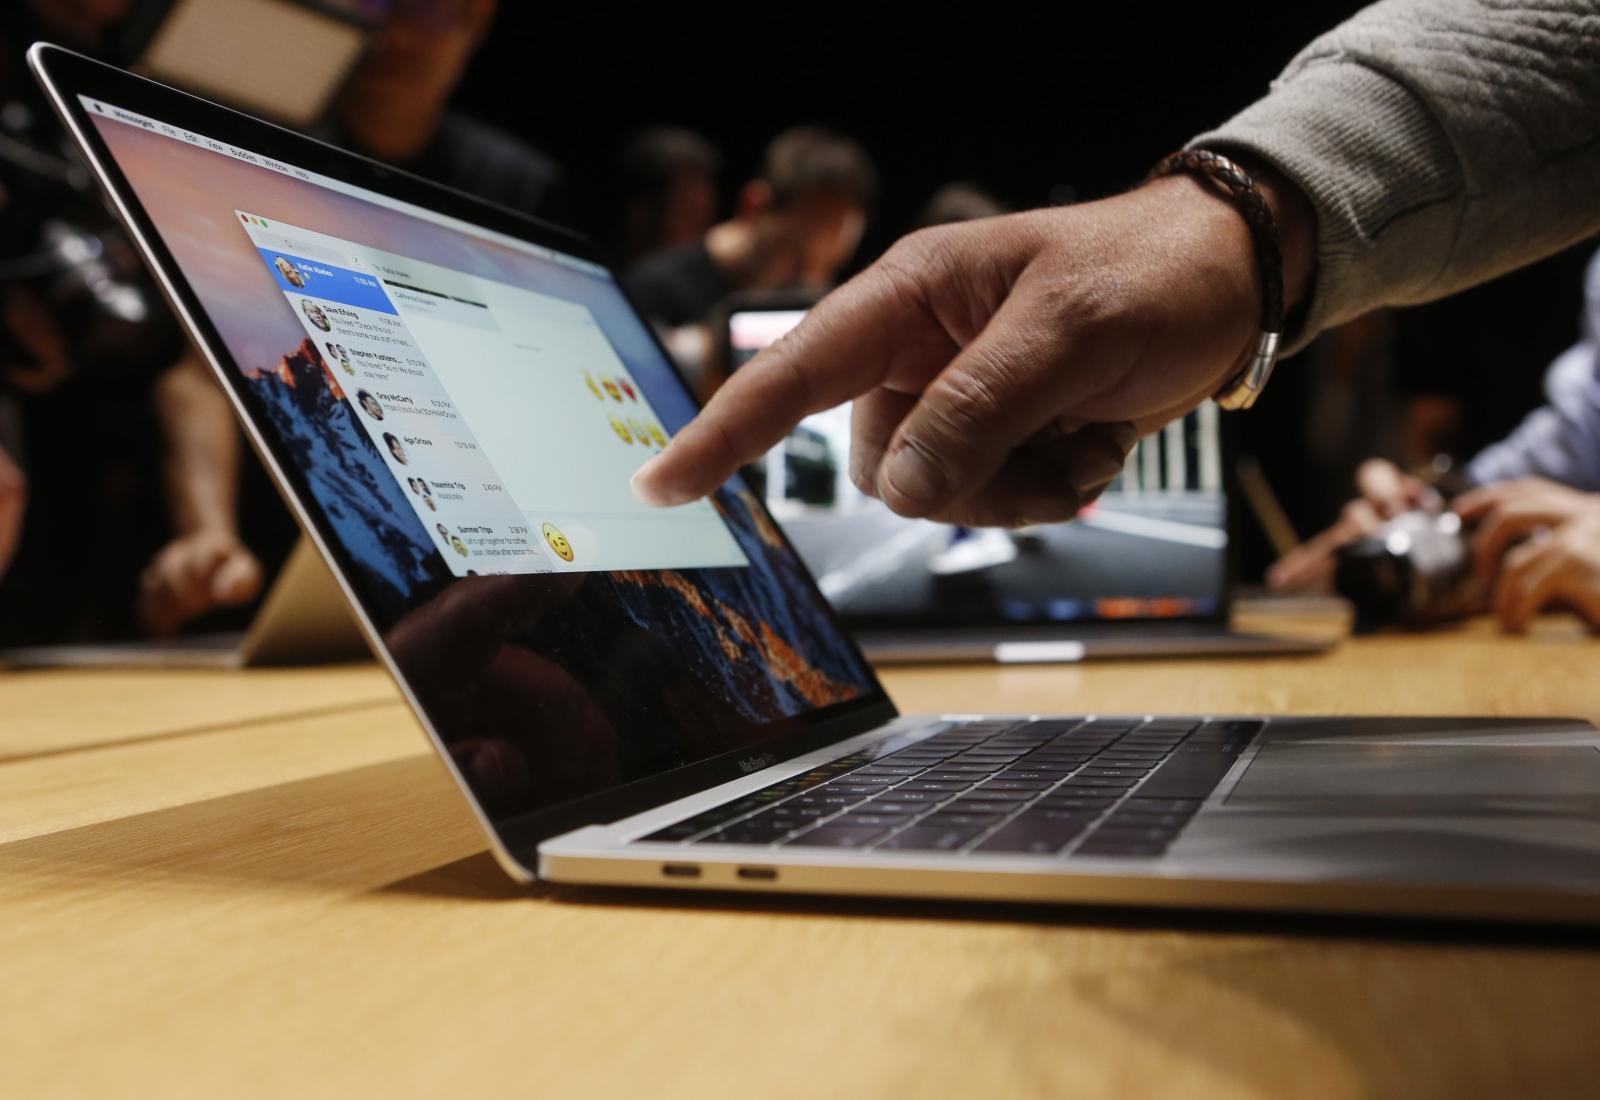 Apple Mac secret surveillance software